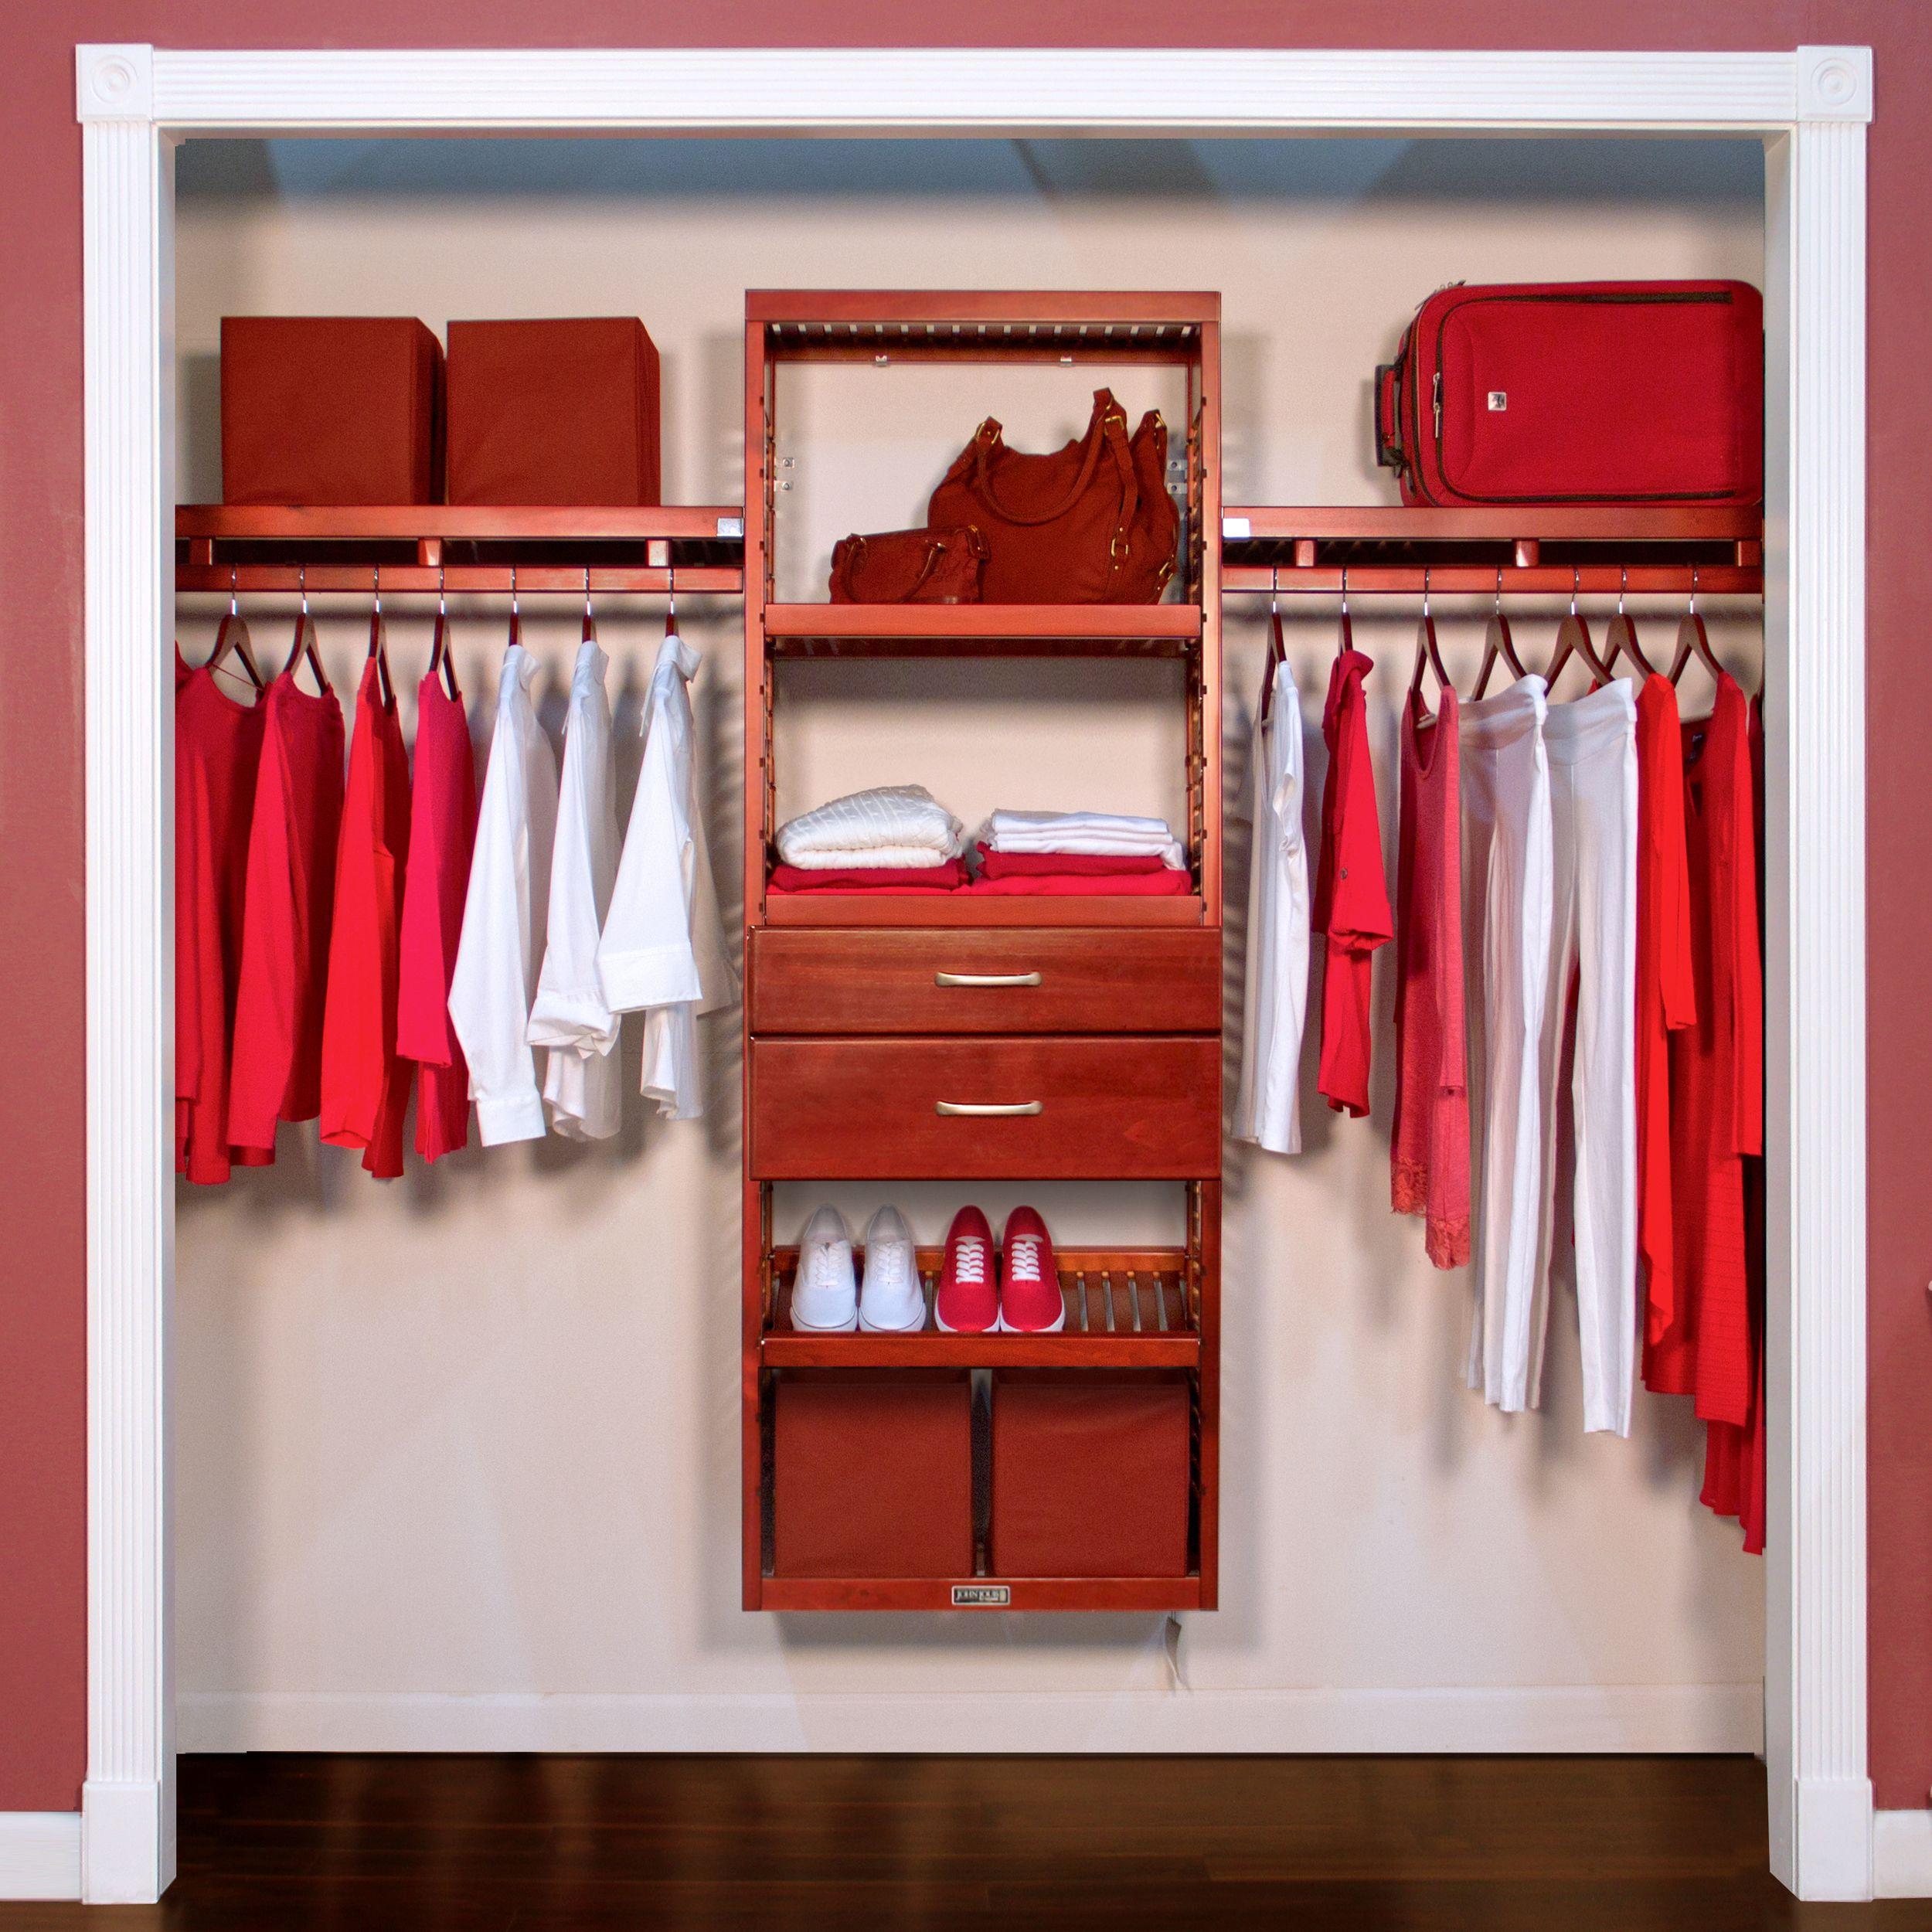 12in deep simplicity organizer 2 drawer 6 8in deep